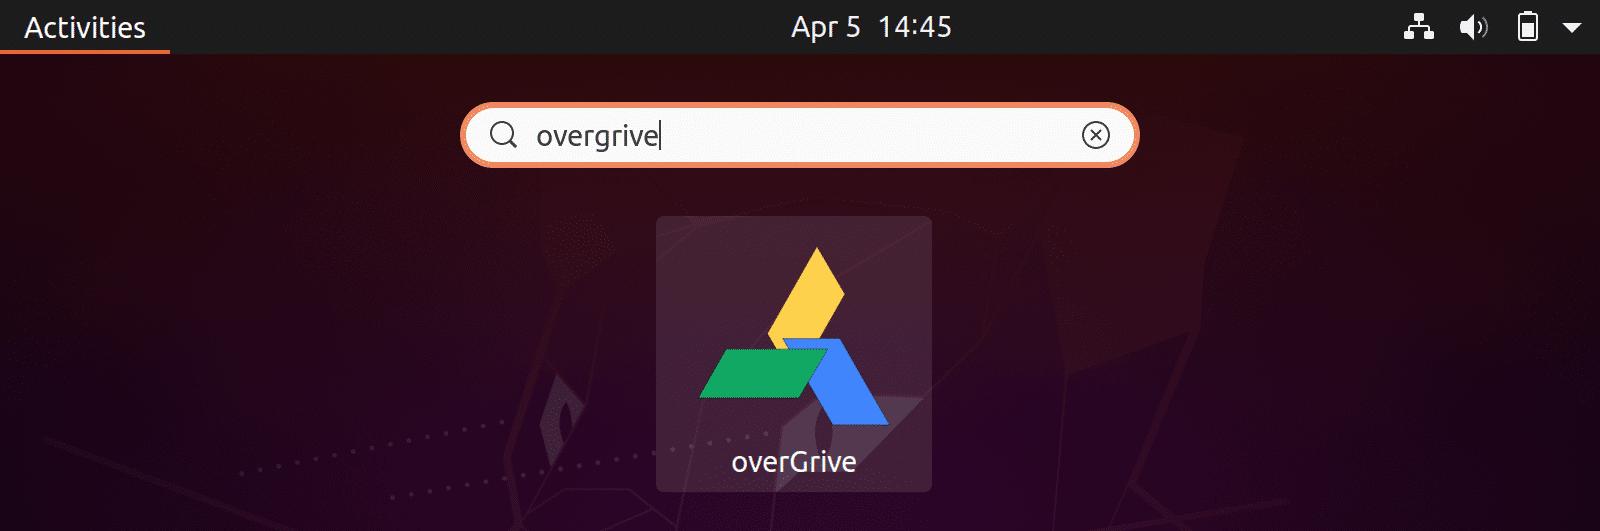 Overgrive Googledrive No Linux